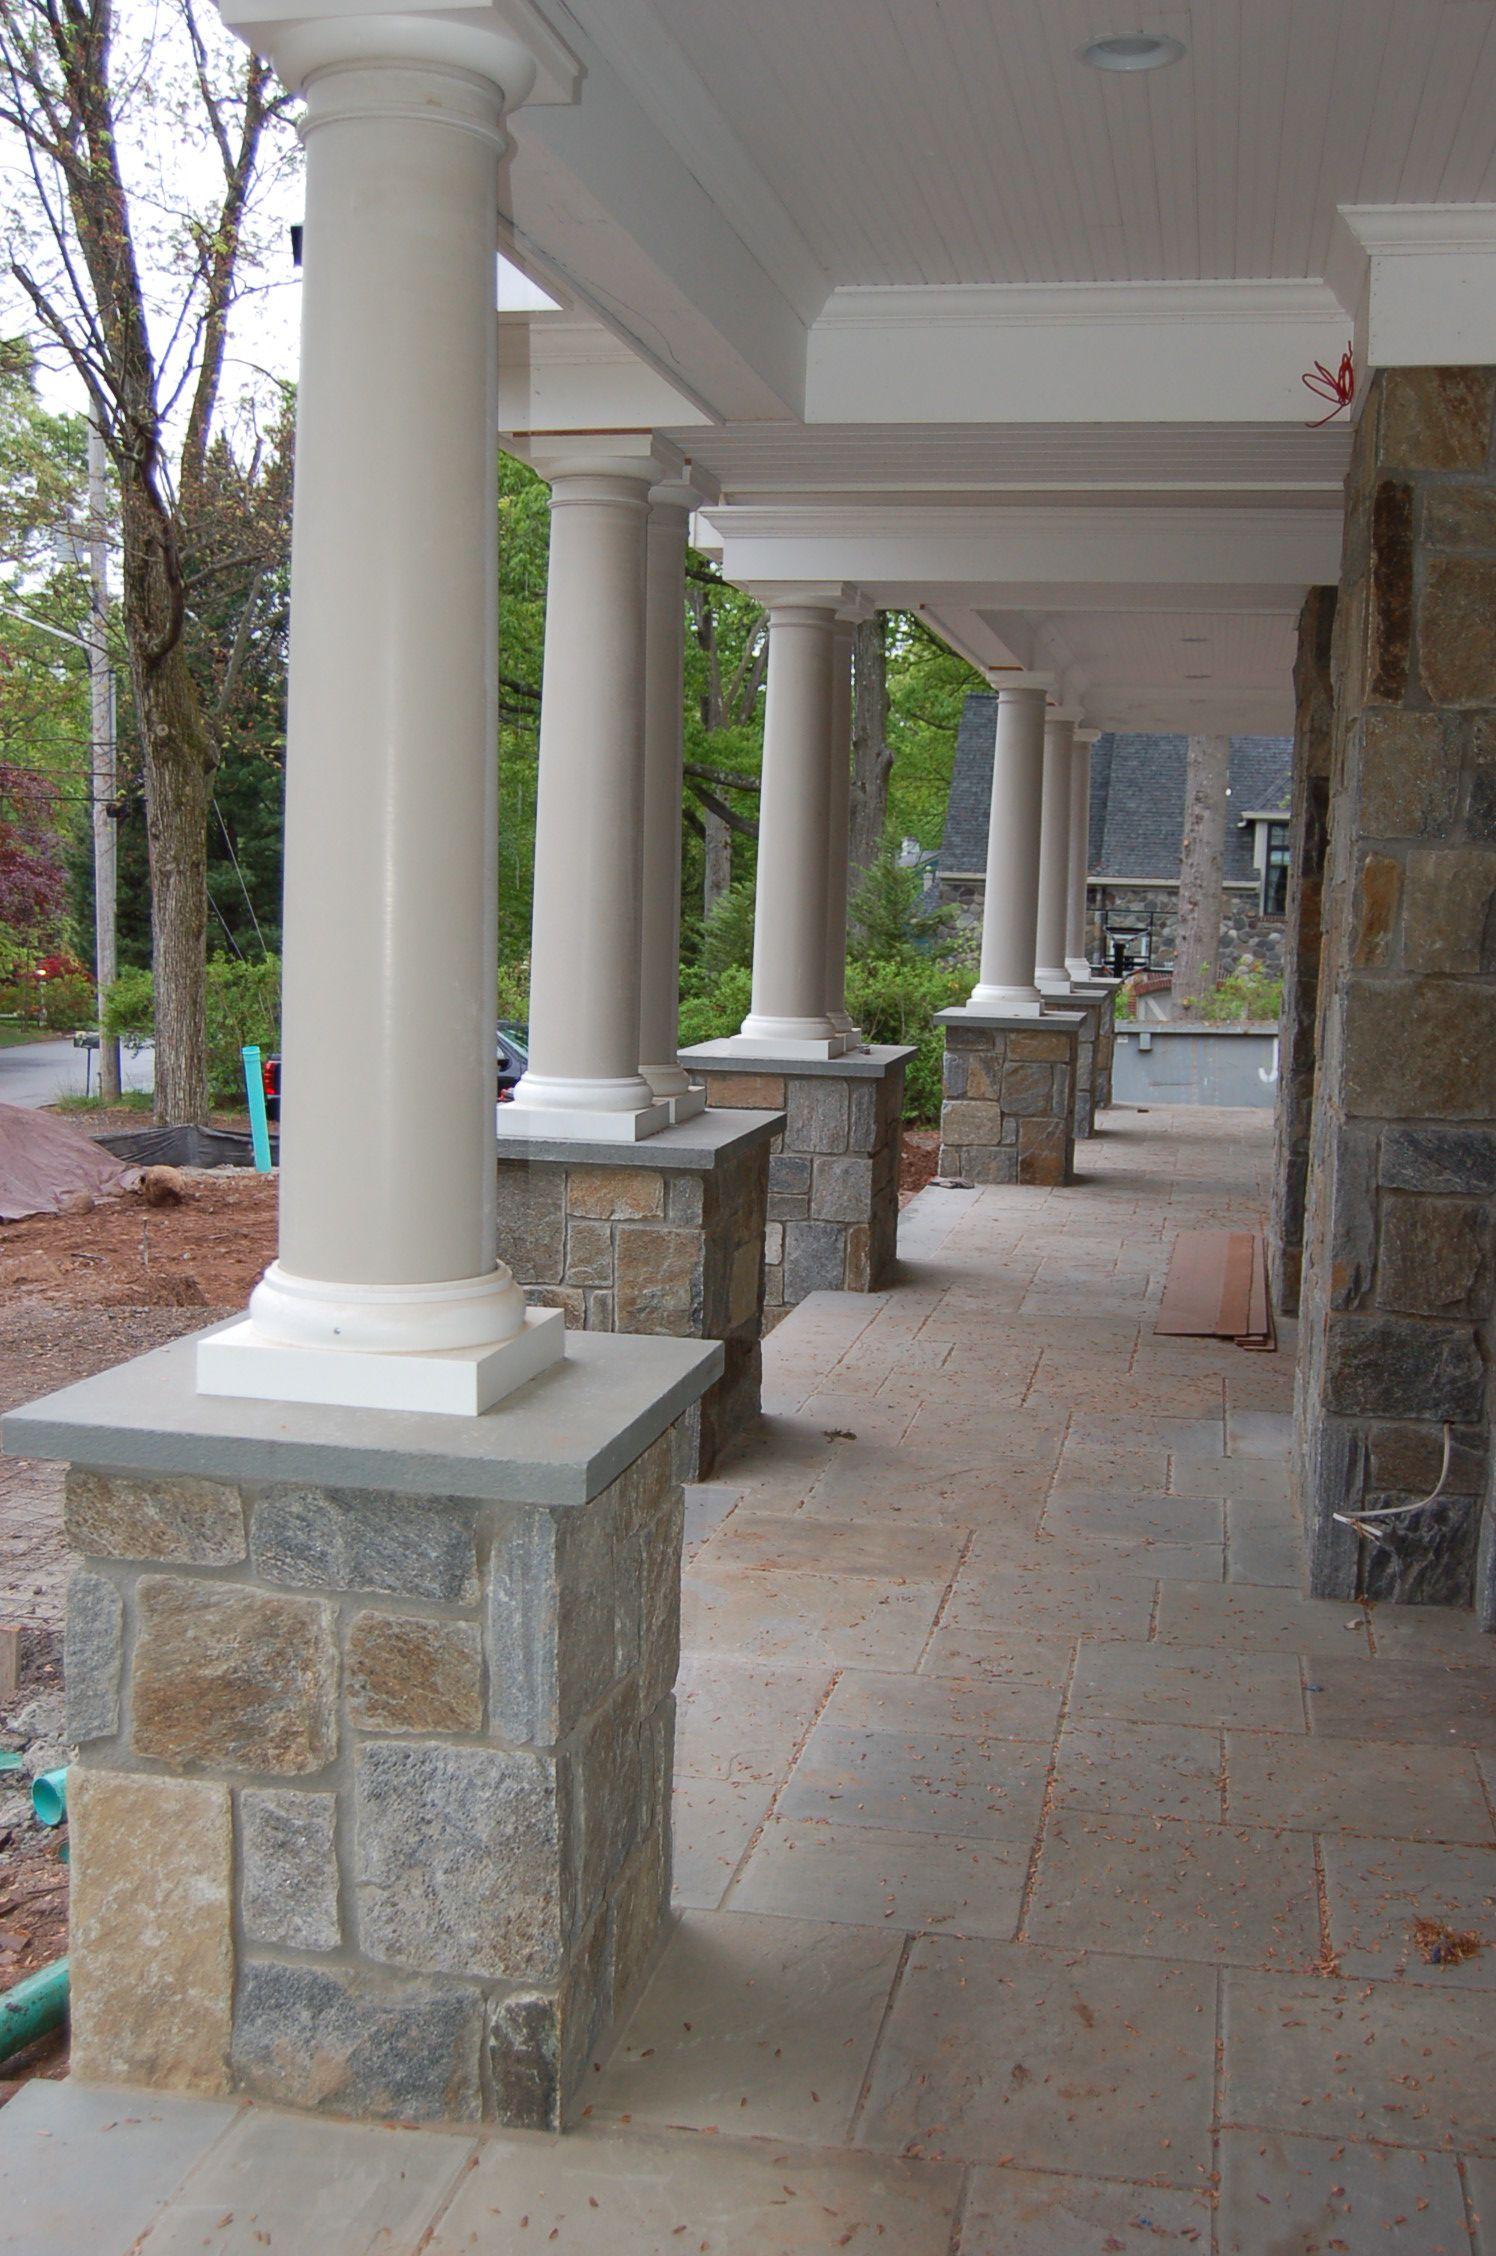 For This Job In Wyckoff Braen Supply Inc Provided The Irish Manor Granite In Full 4 Building Stone Veneer In Squ Building Stone Enclosed Decks Stone Veneer